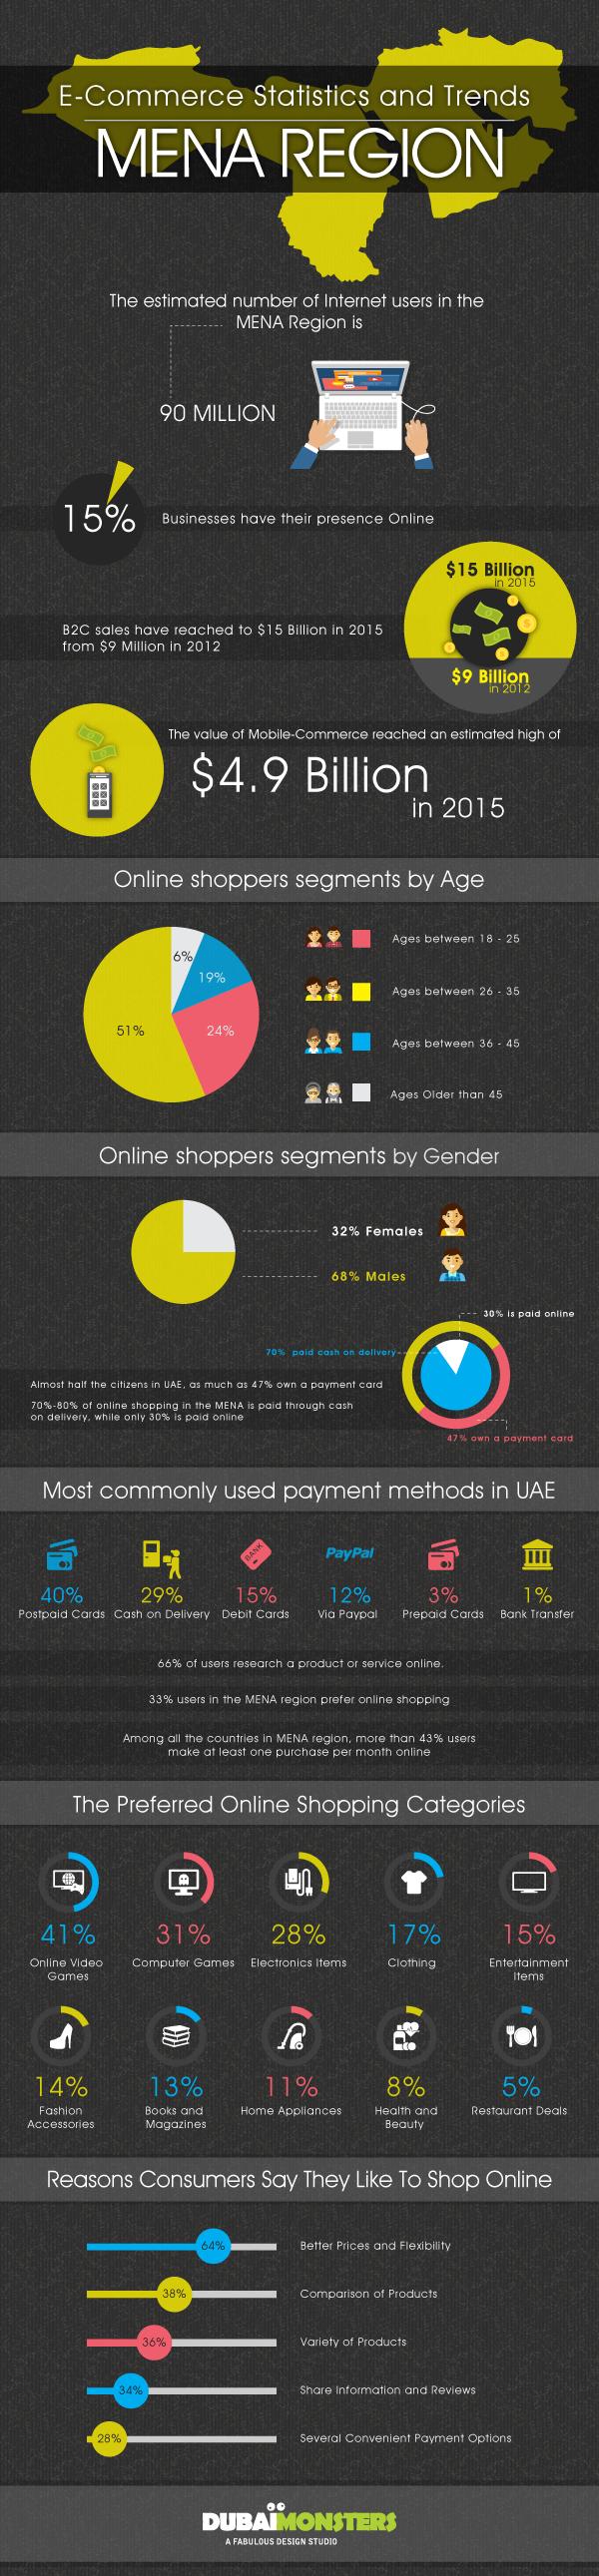 infographic_e-commerce-statistics-1-847mb